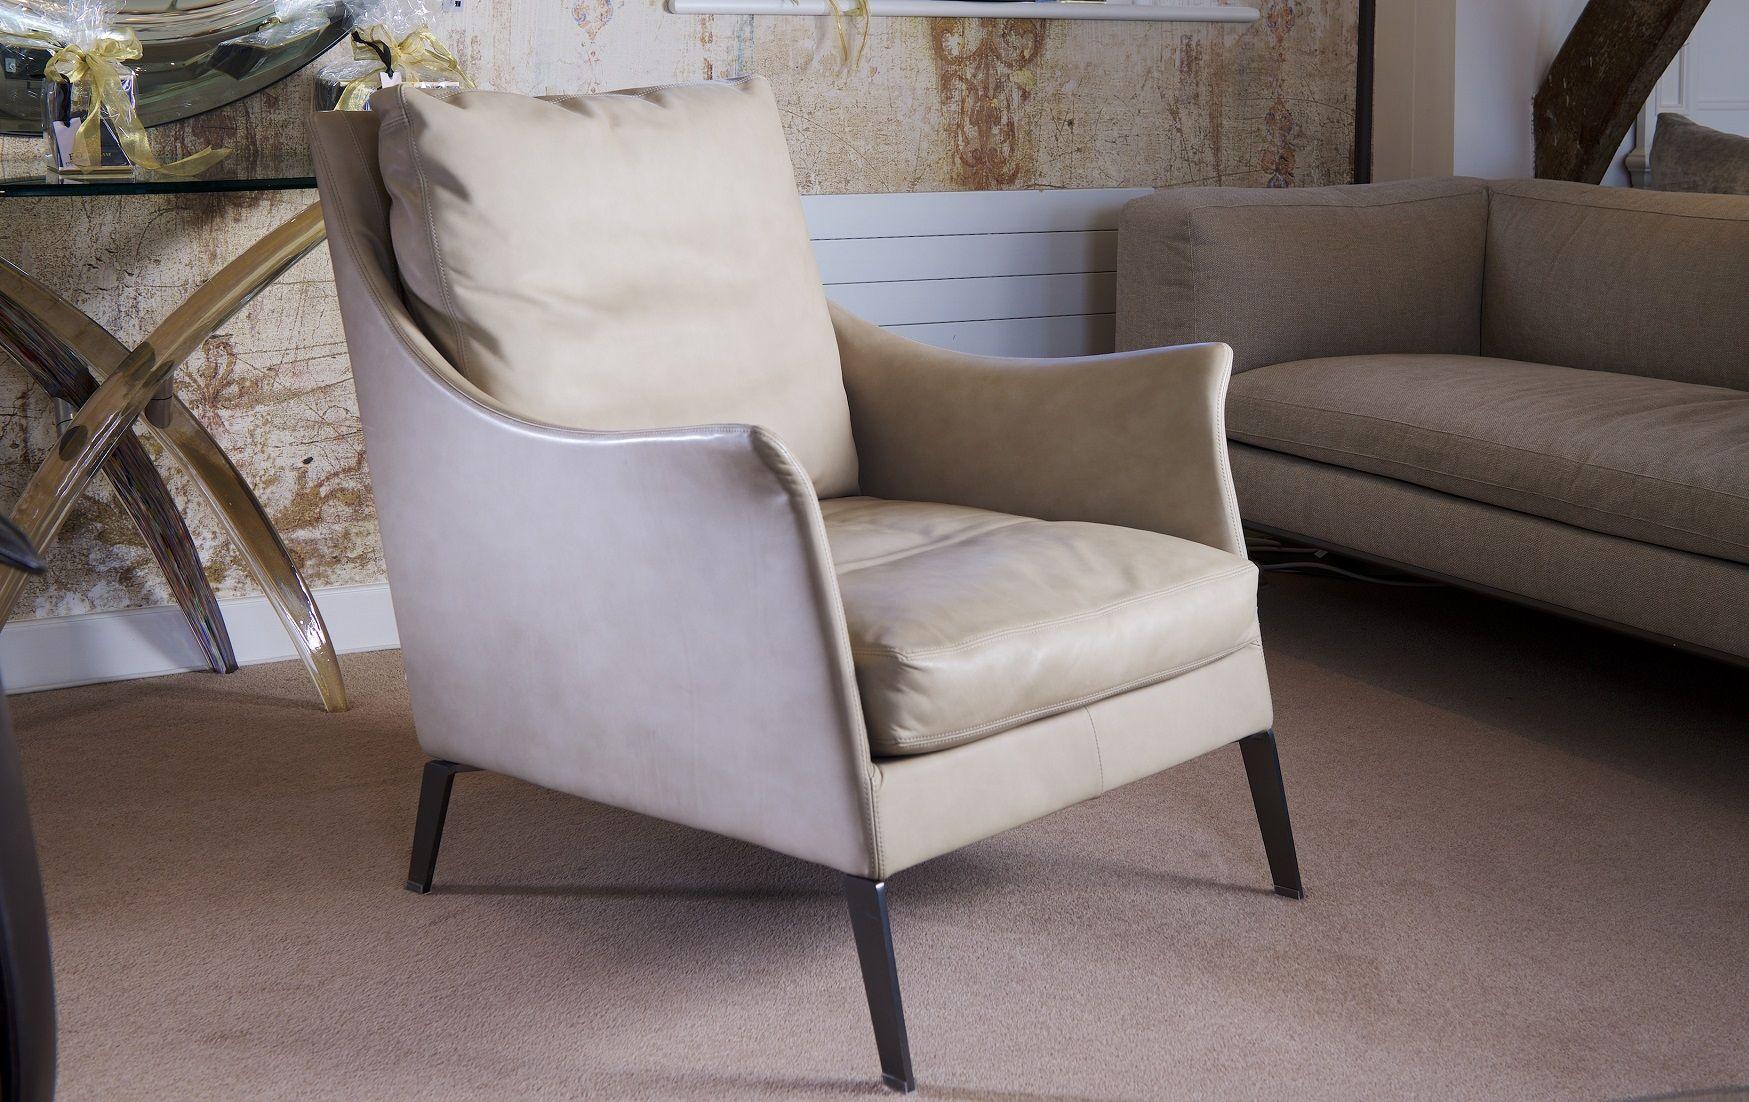 Colombo Divani A Meda boss armchair   studio italia